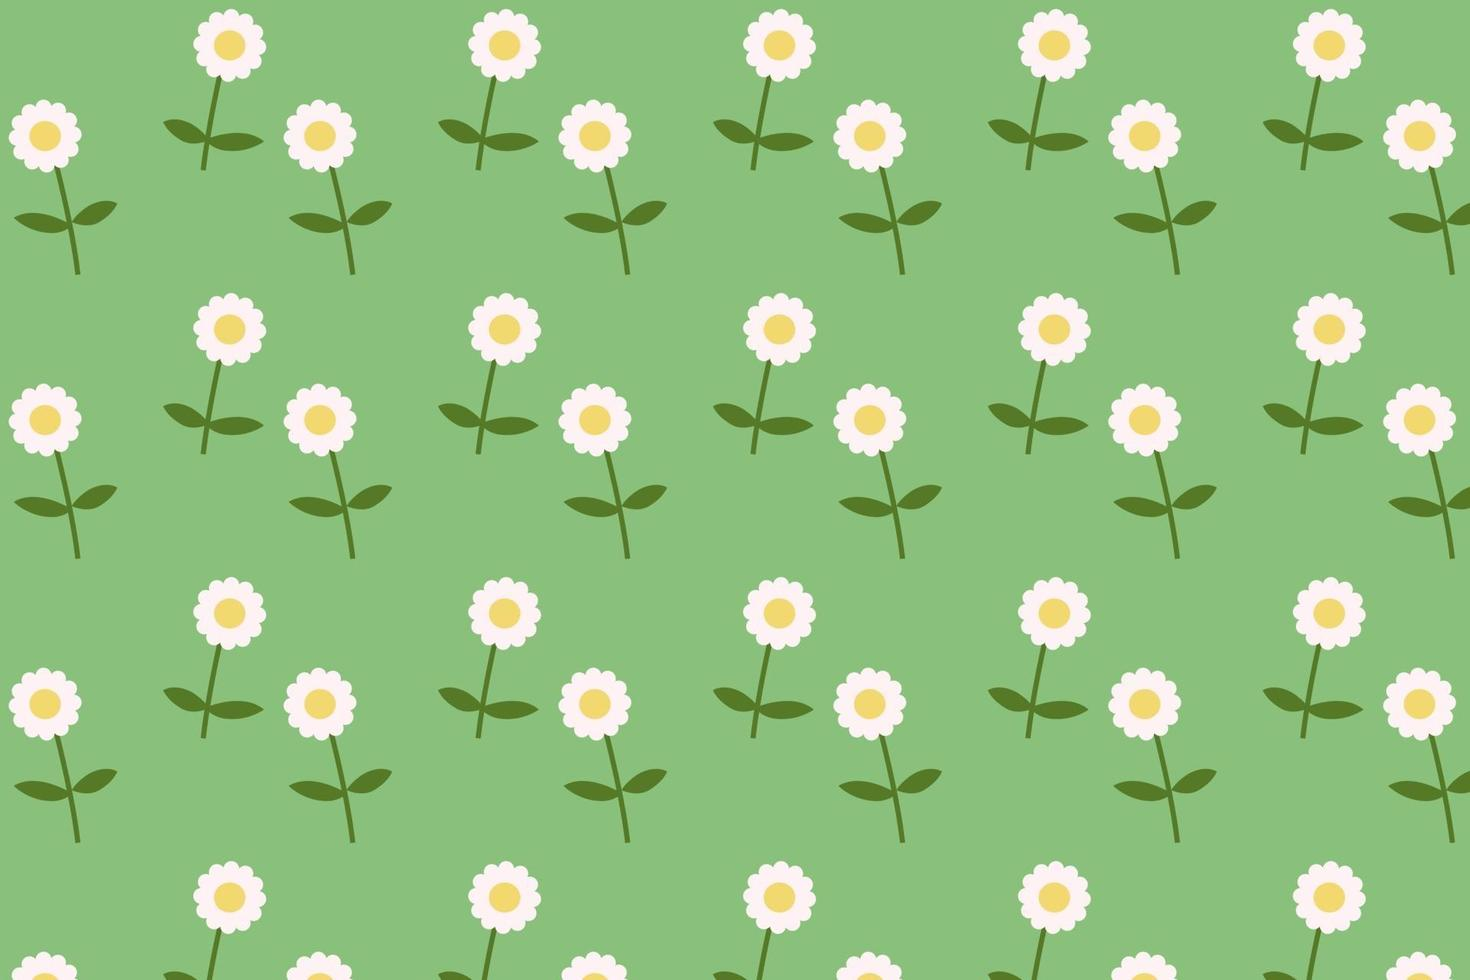 daisy blommande mönster platt stil bakgrundsvektor. blommatextil med grön bakgrund vektor